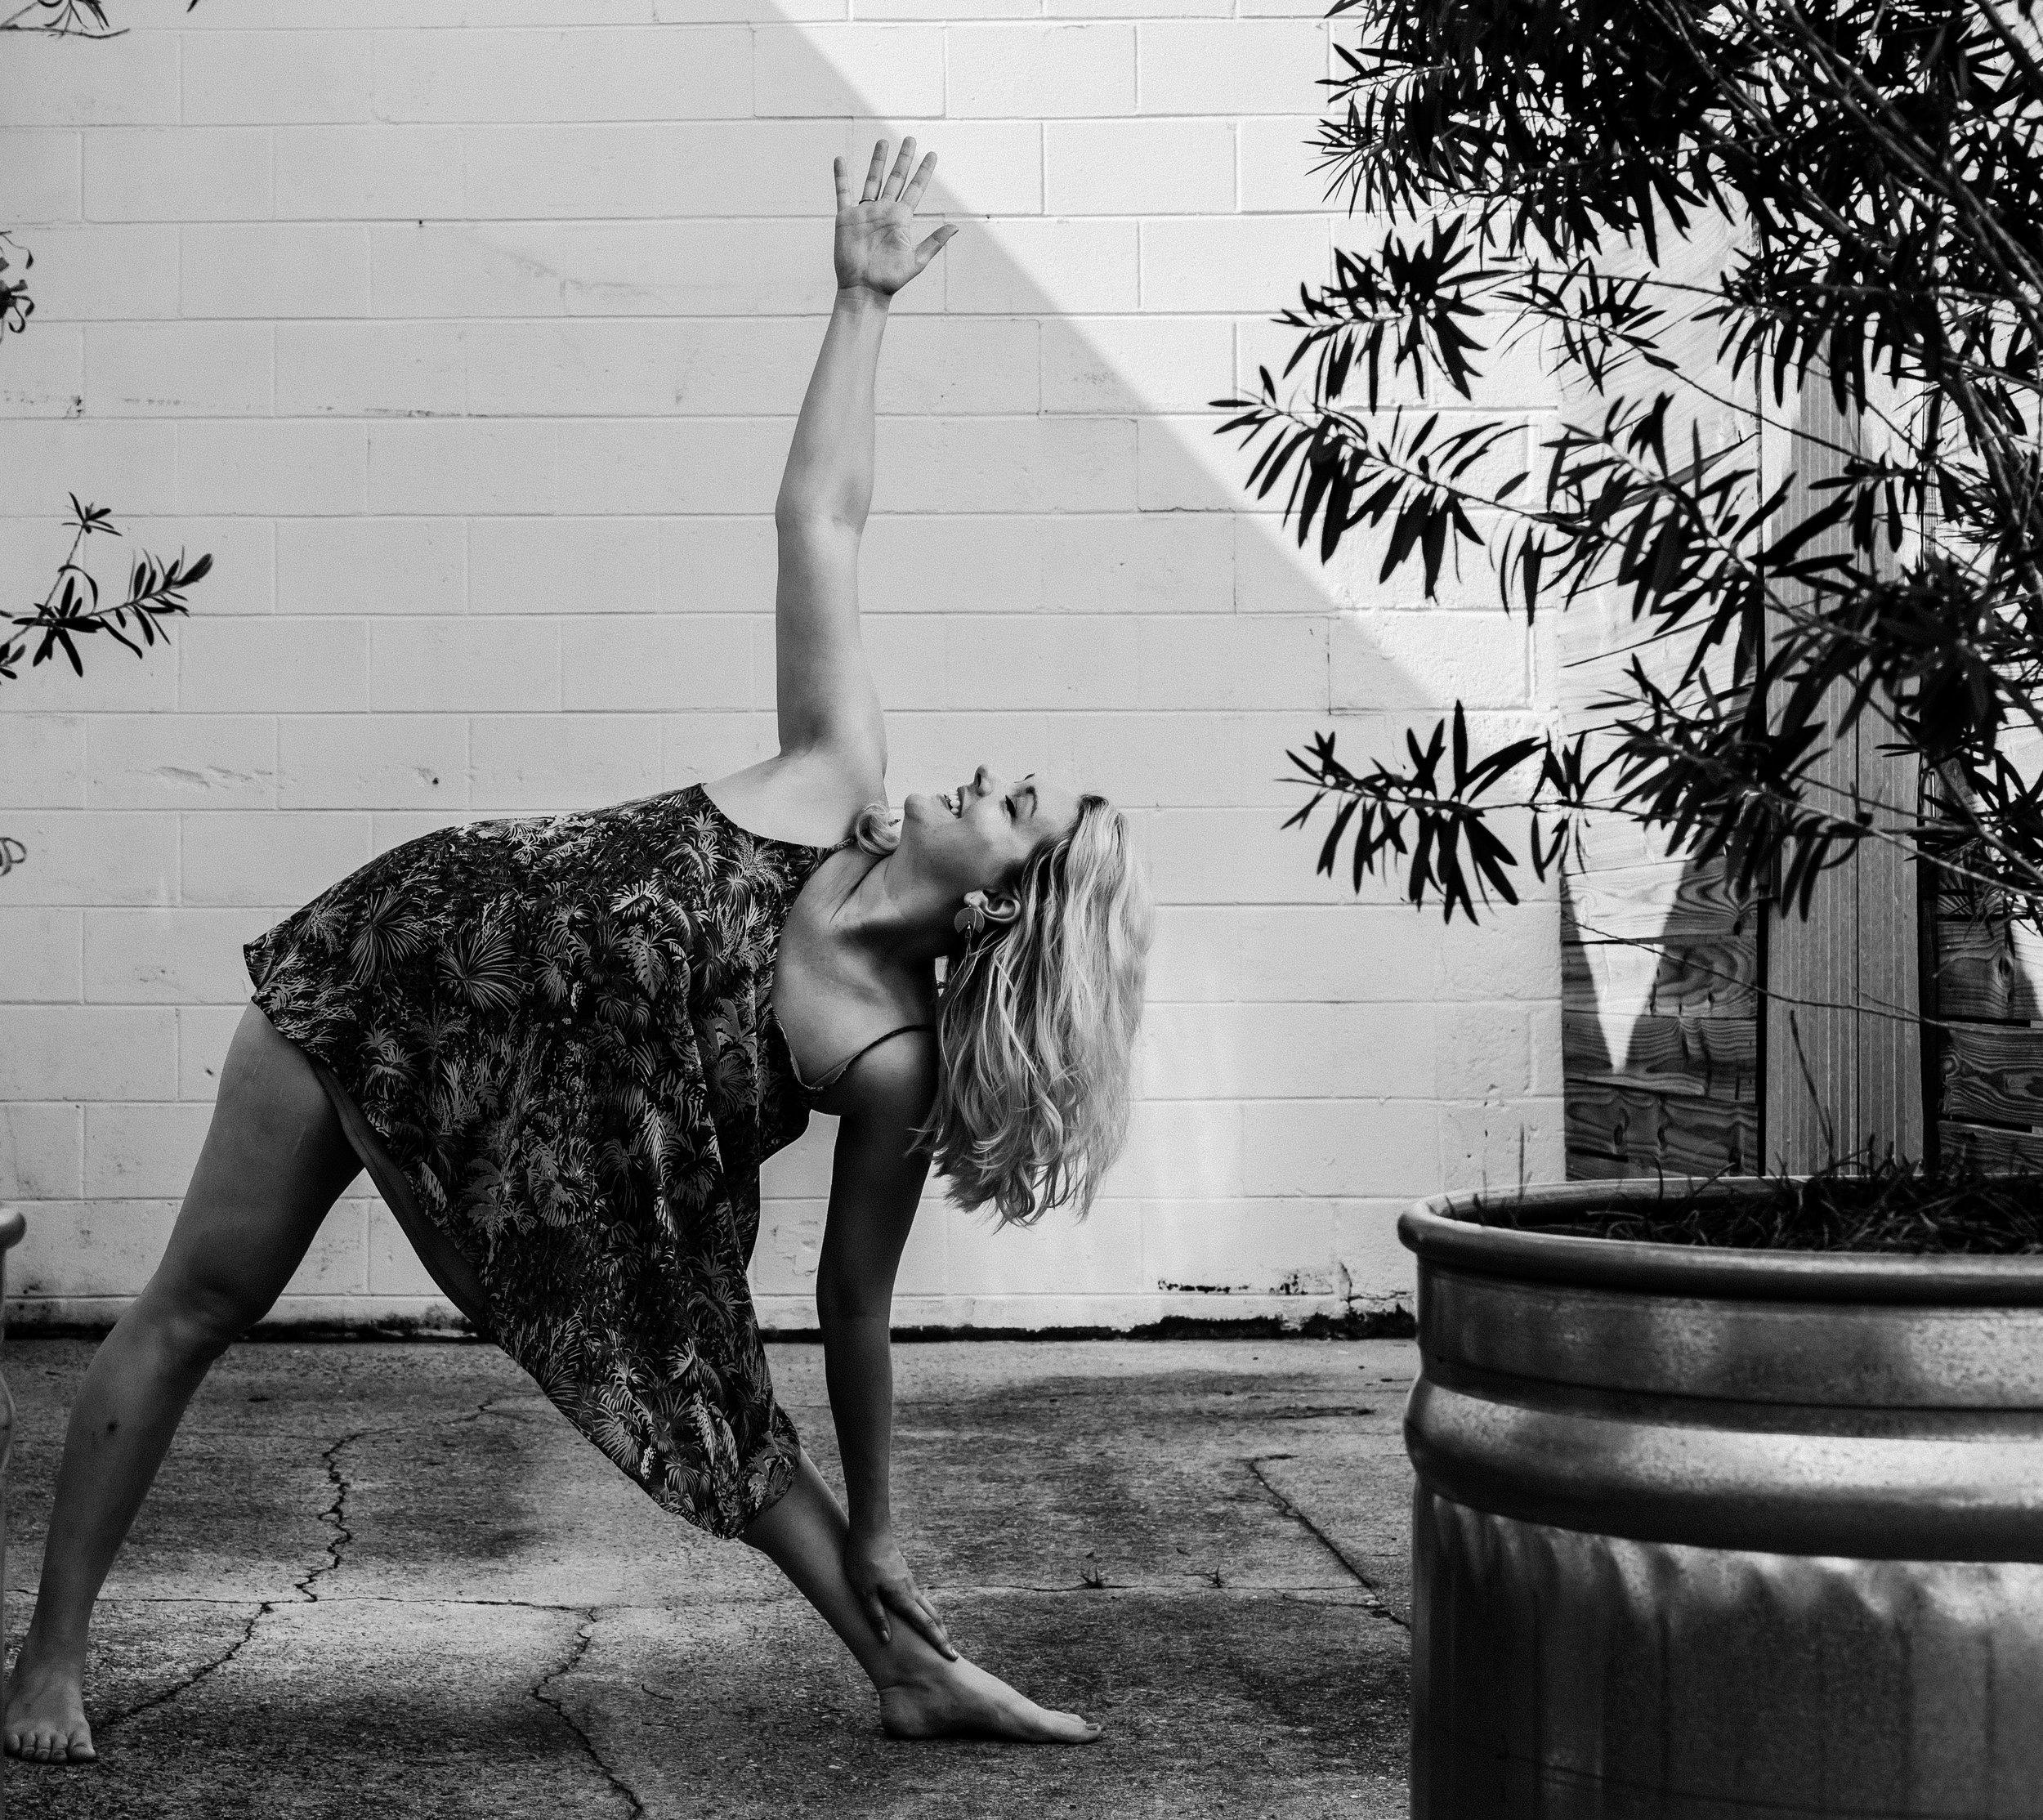 Julianna Delgado is our 200 hour certified yoga teacher